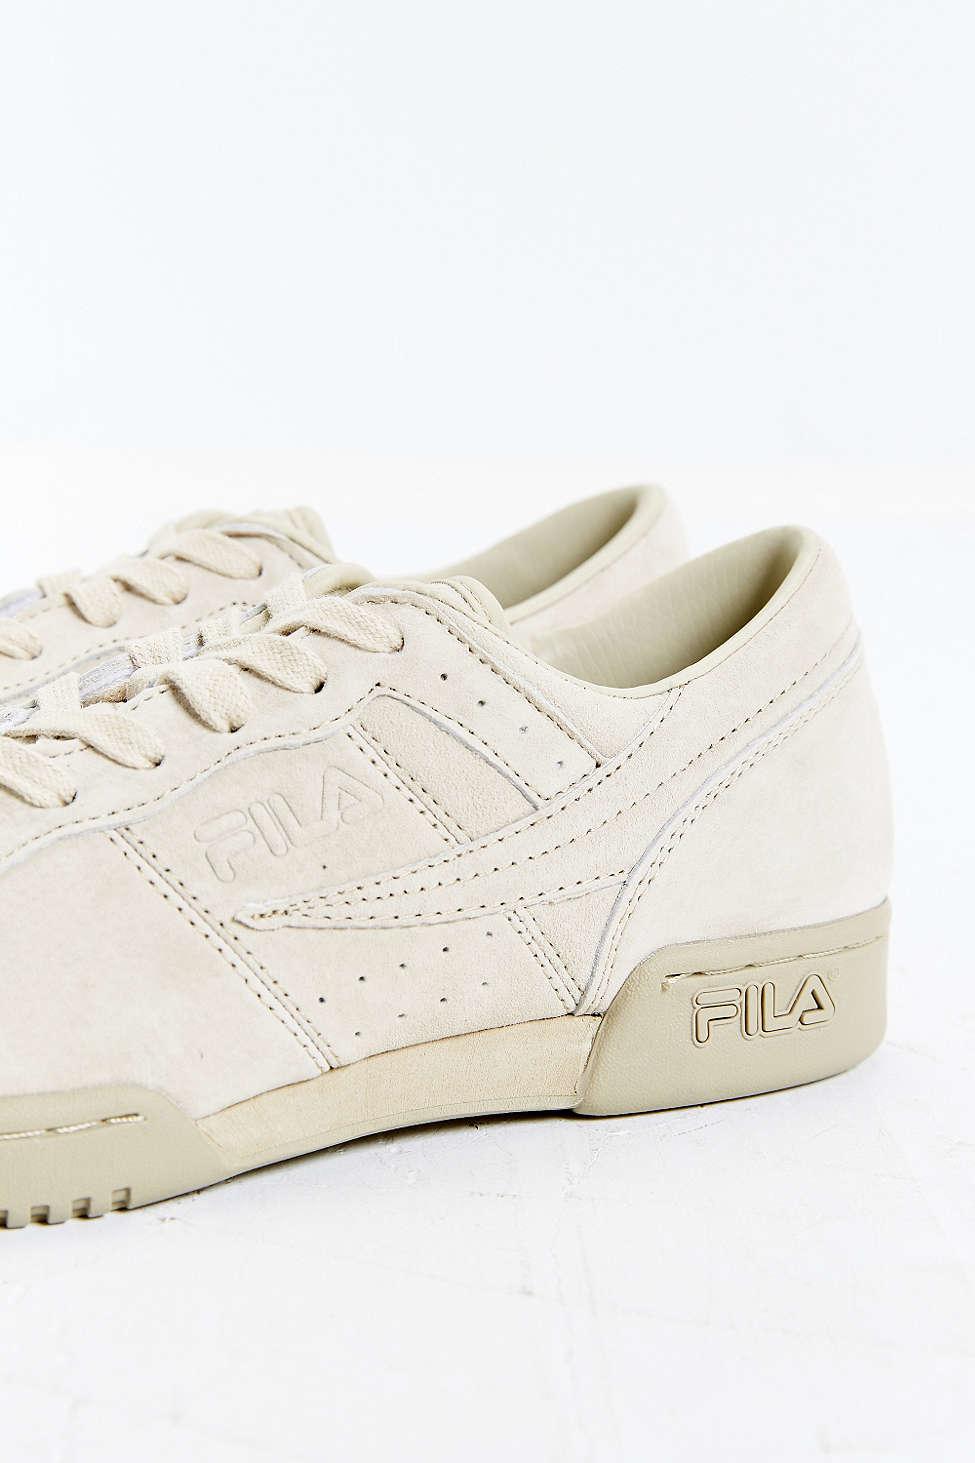 1cdfb704a9de Lyst - Fila Original Fitness Suede Sneaker in Brown for Men